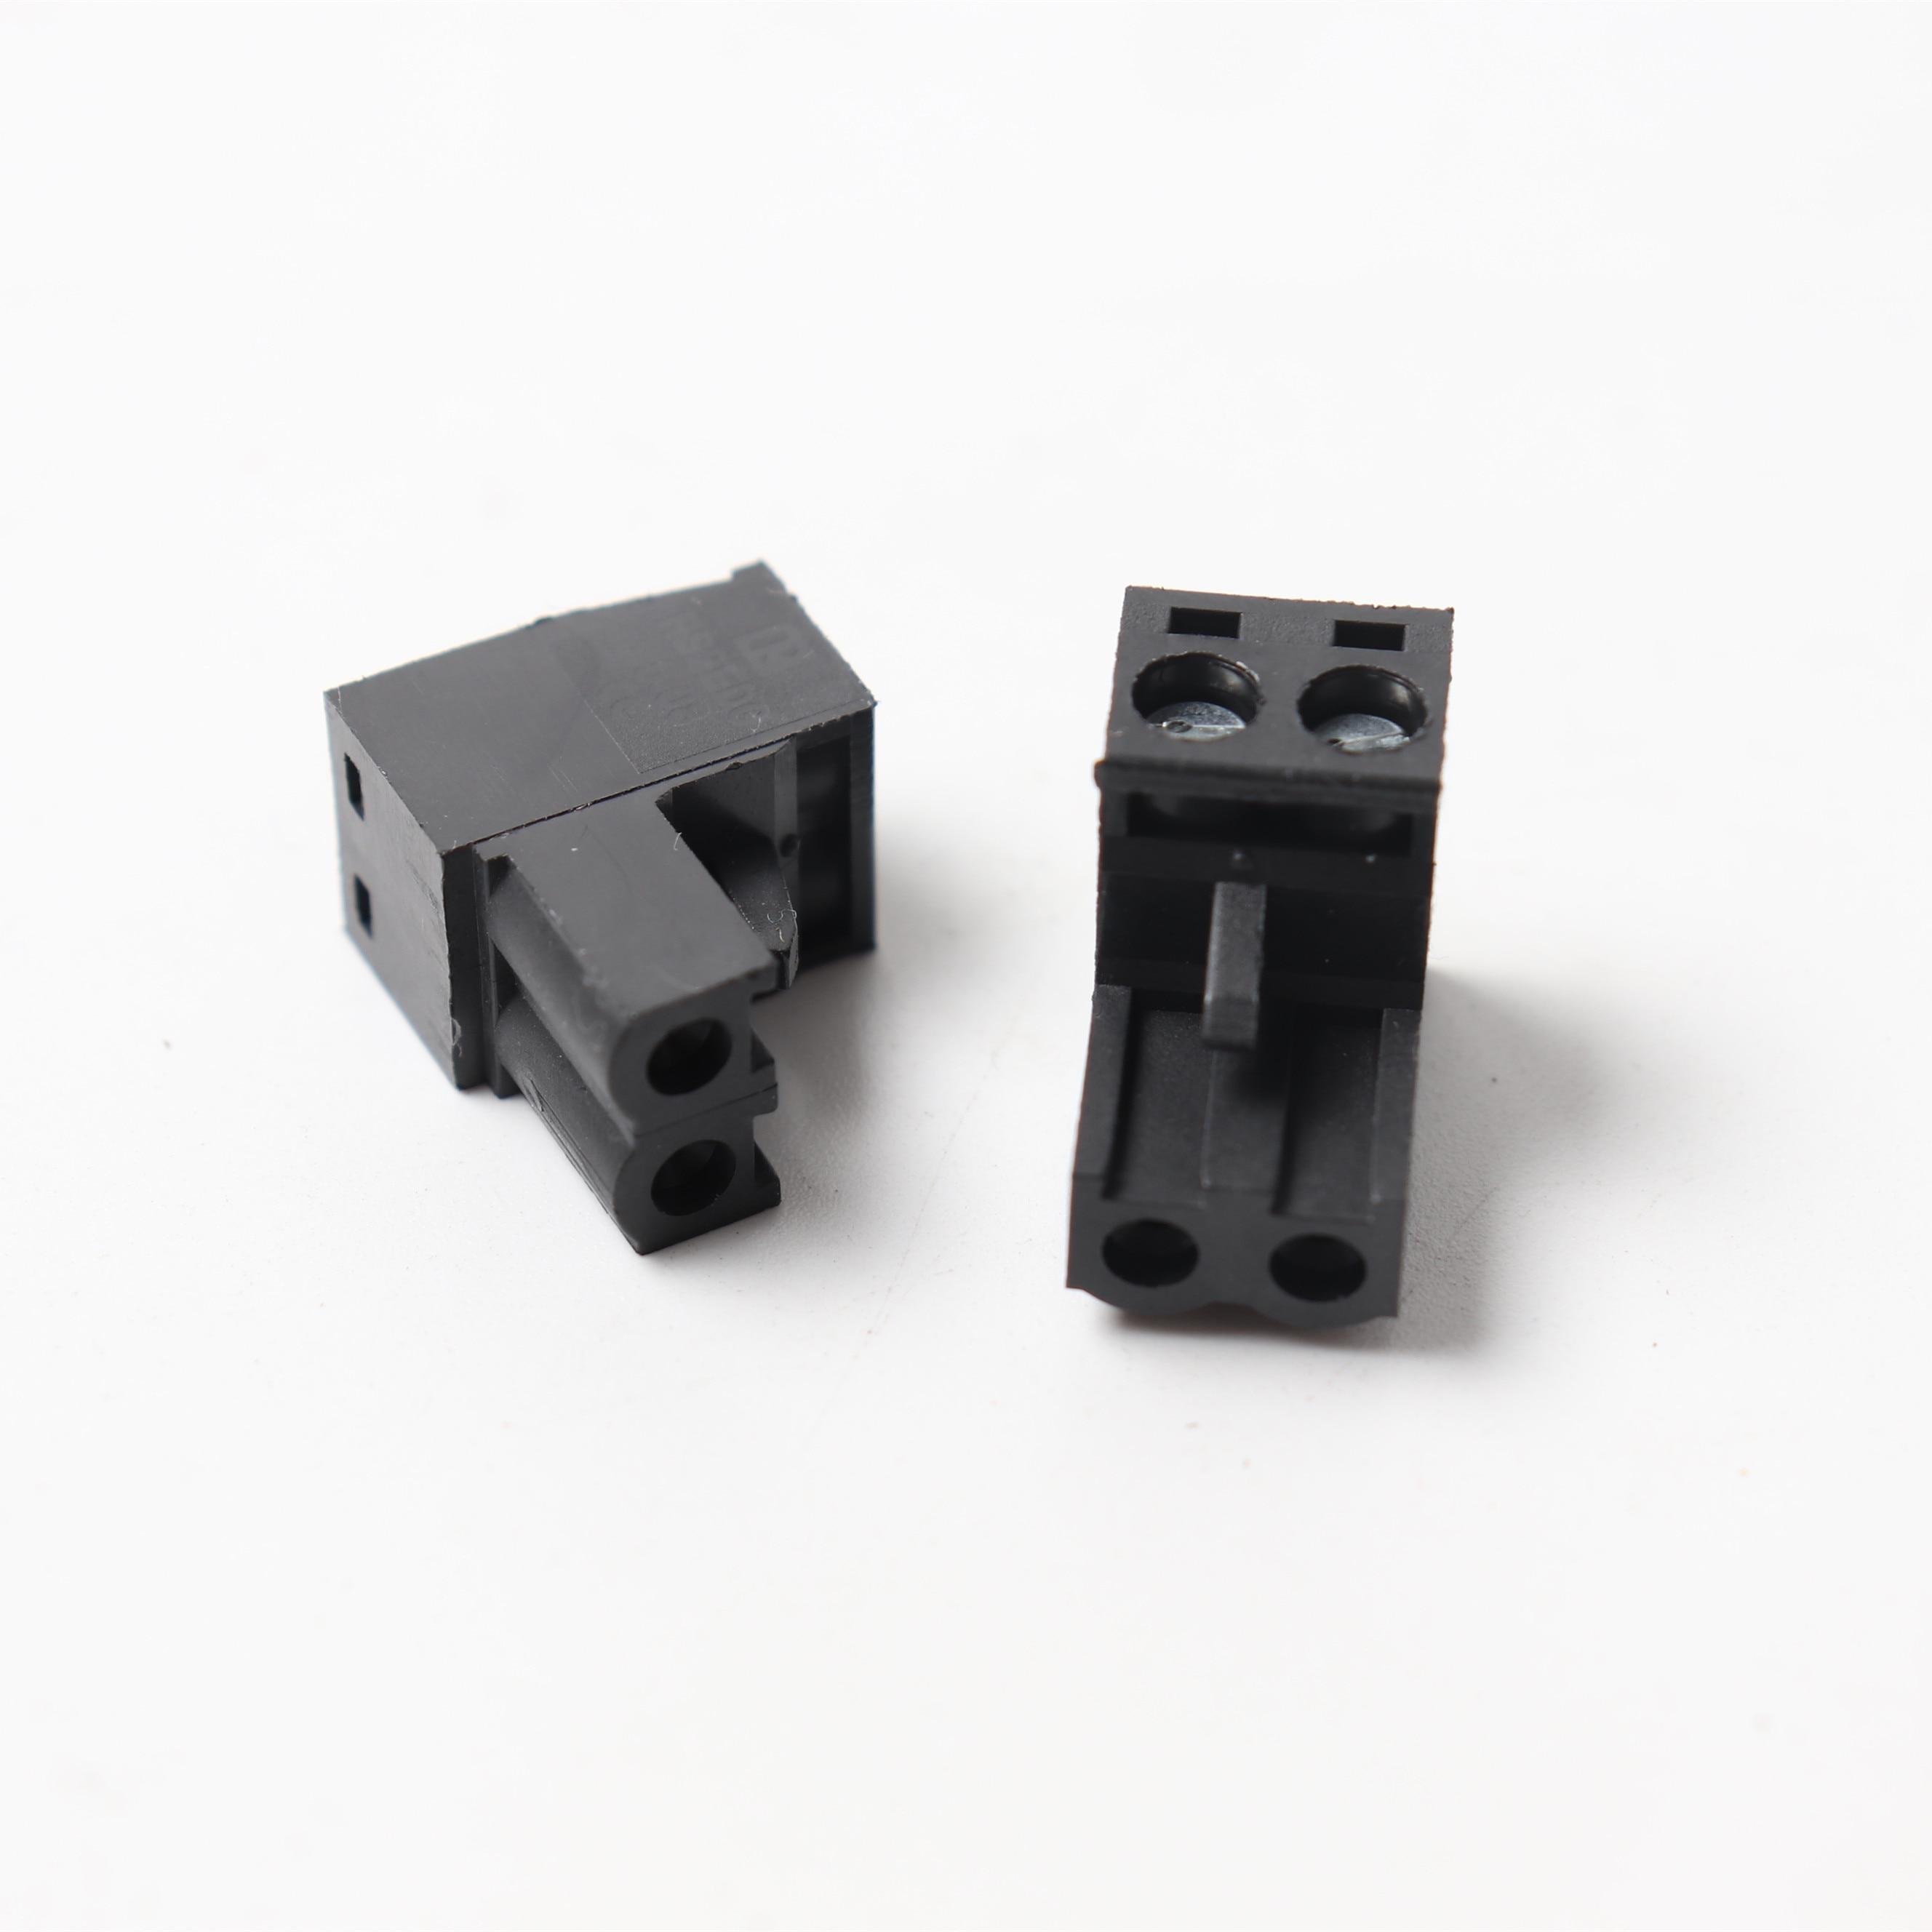 Prusa i3 mk2s-mk3 hotend cartridge Terminal block for Mini-Rambo, Einsy Rambo